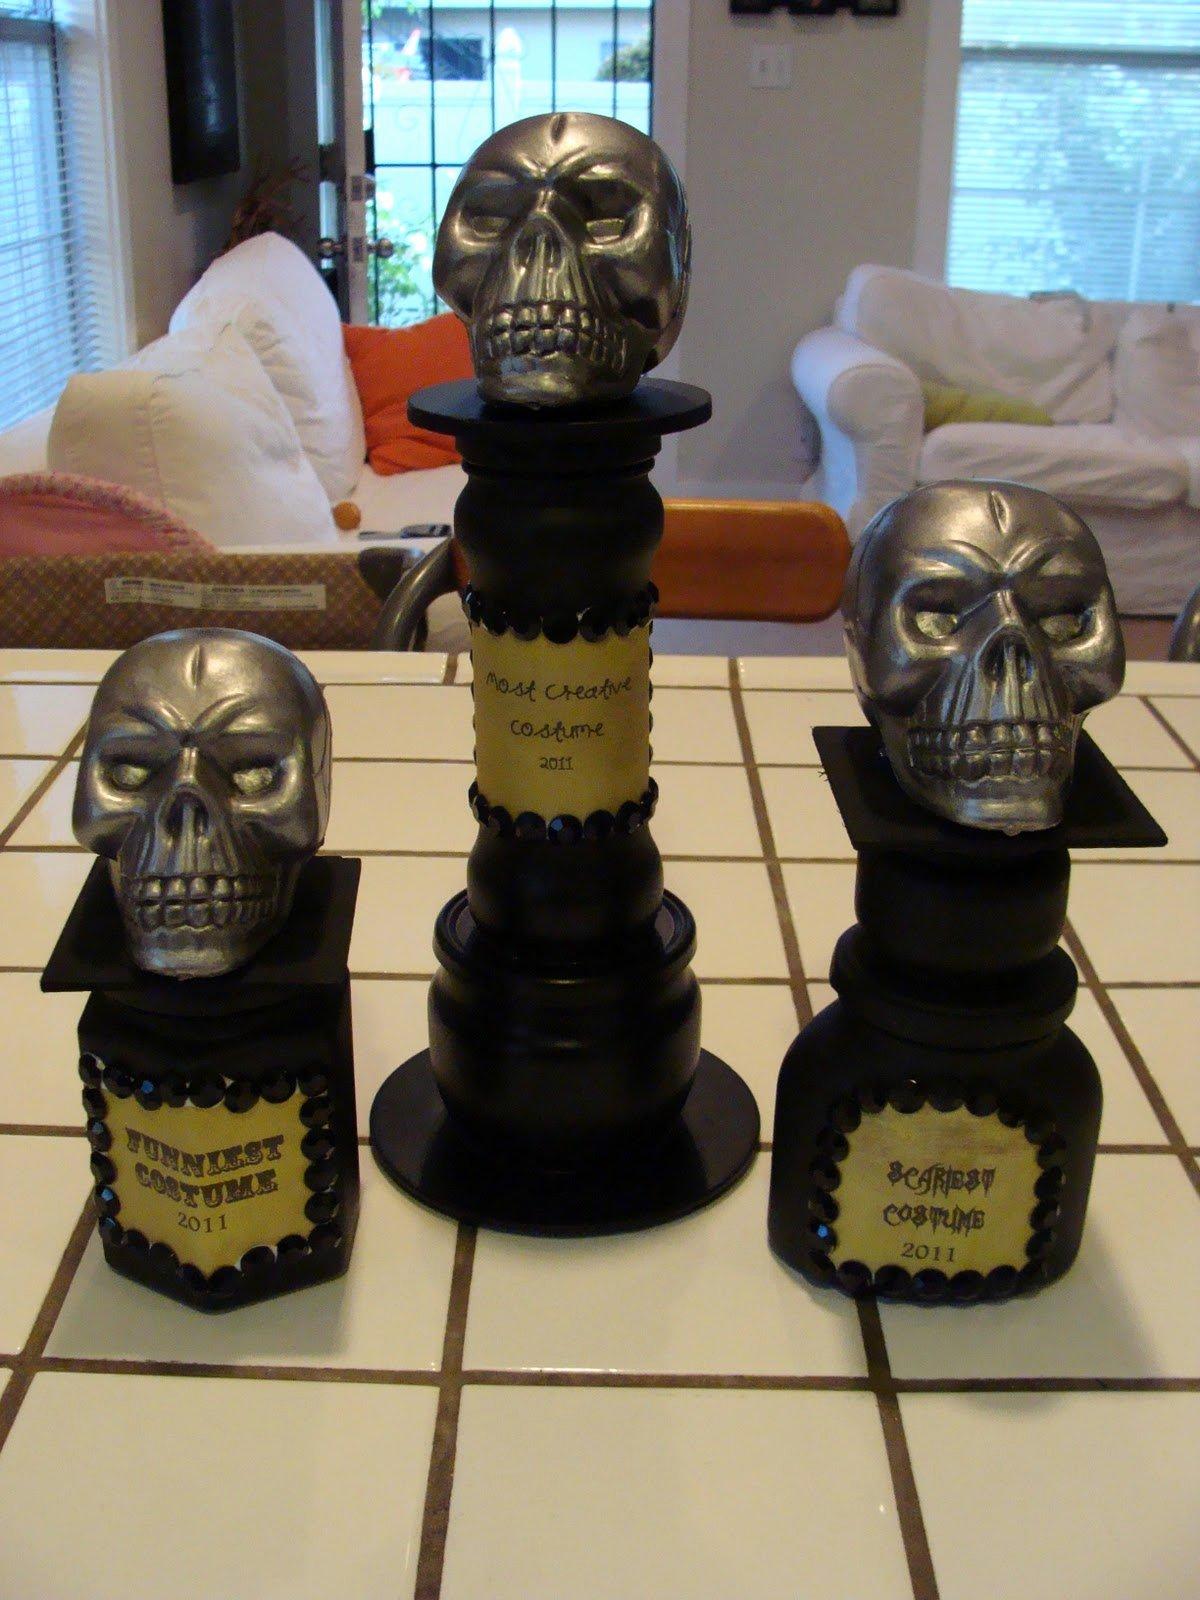 Best Costume Award Trophy Luxury Anna Banannie Diy Halloween Costume Trophies